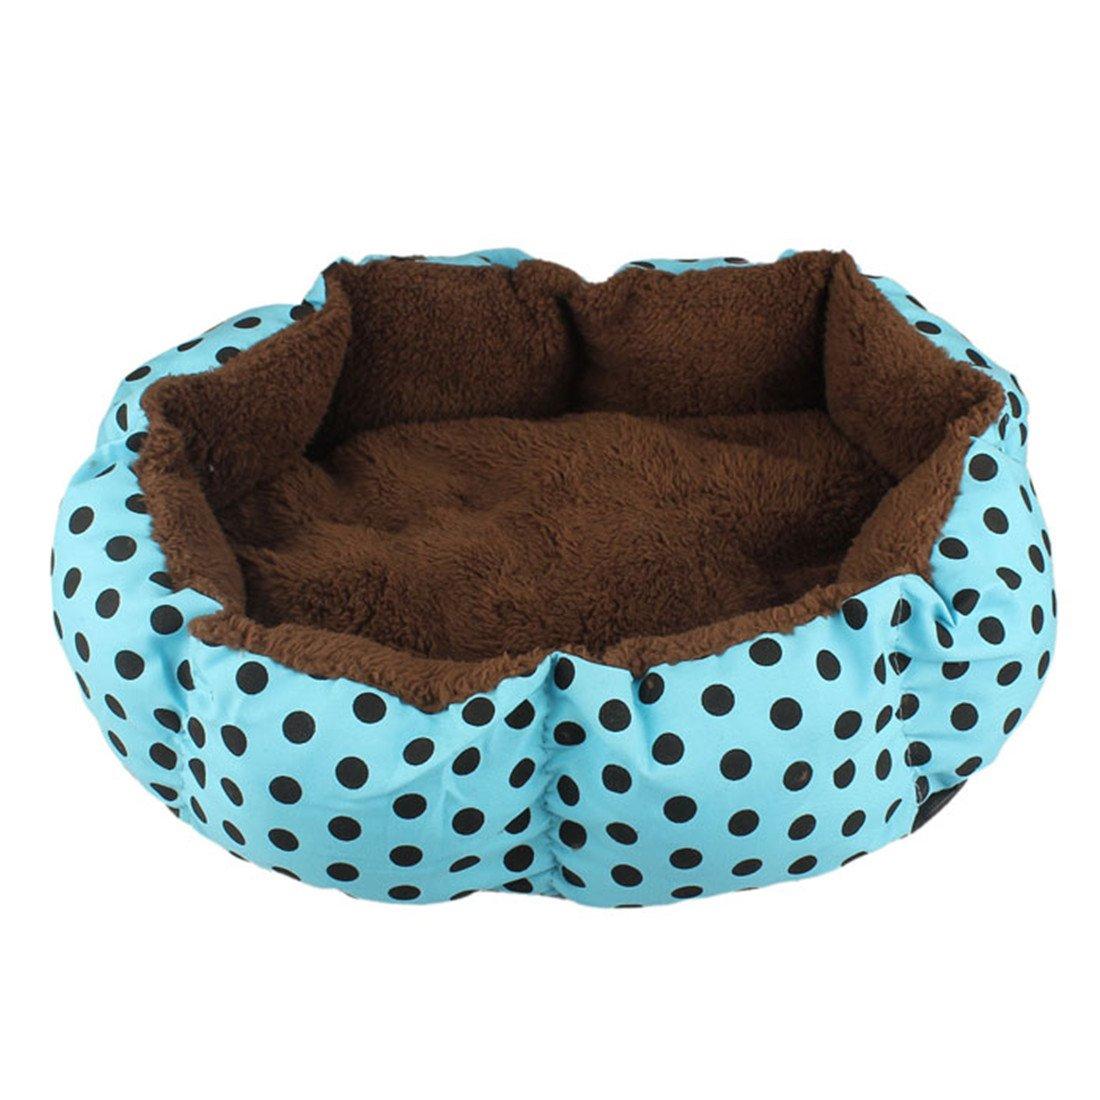 Sumen Soft Dog Puppy Cat Warm Bed Plush Cozy Nest Mat Pad for Pet (Blue)